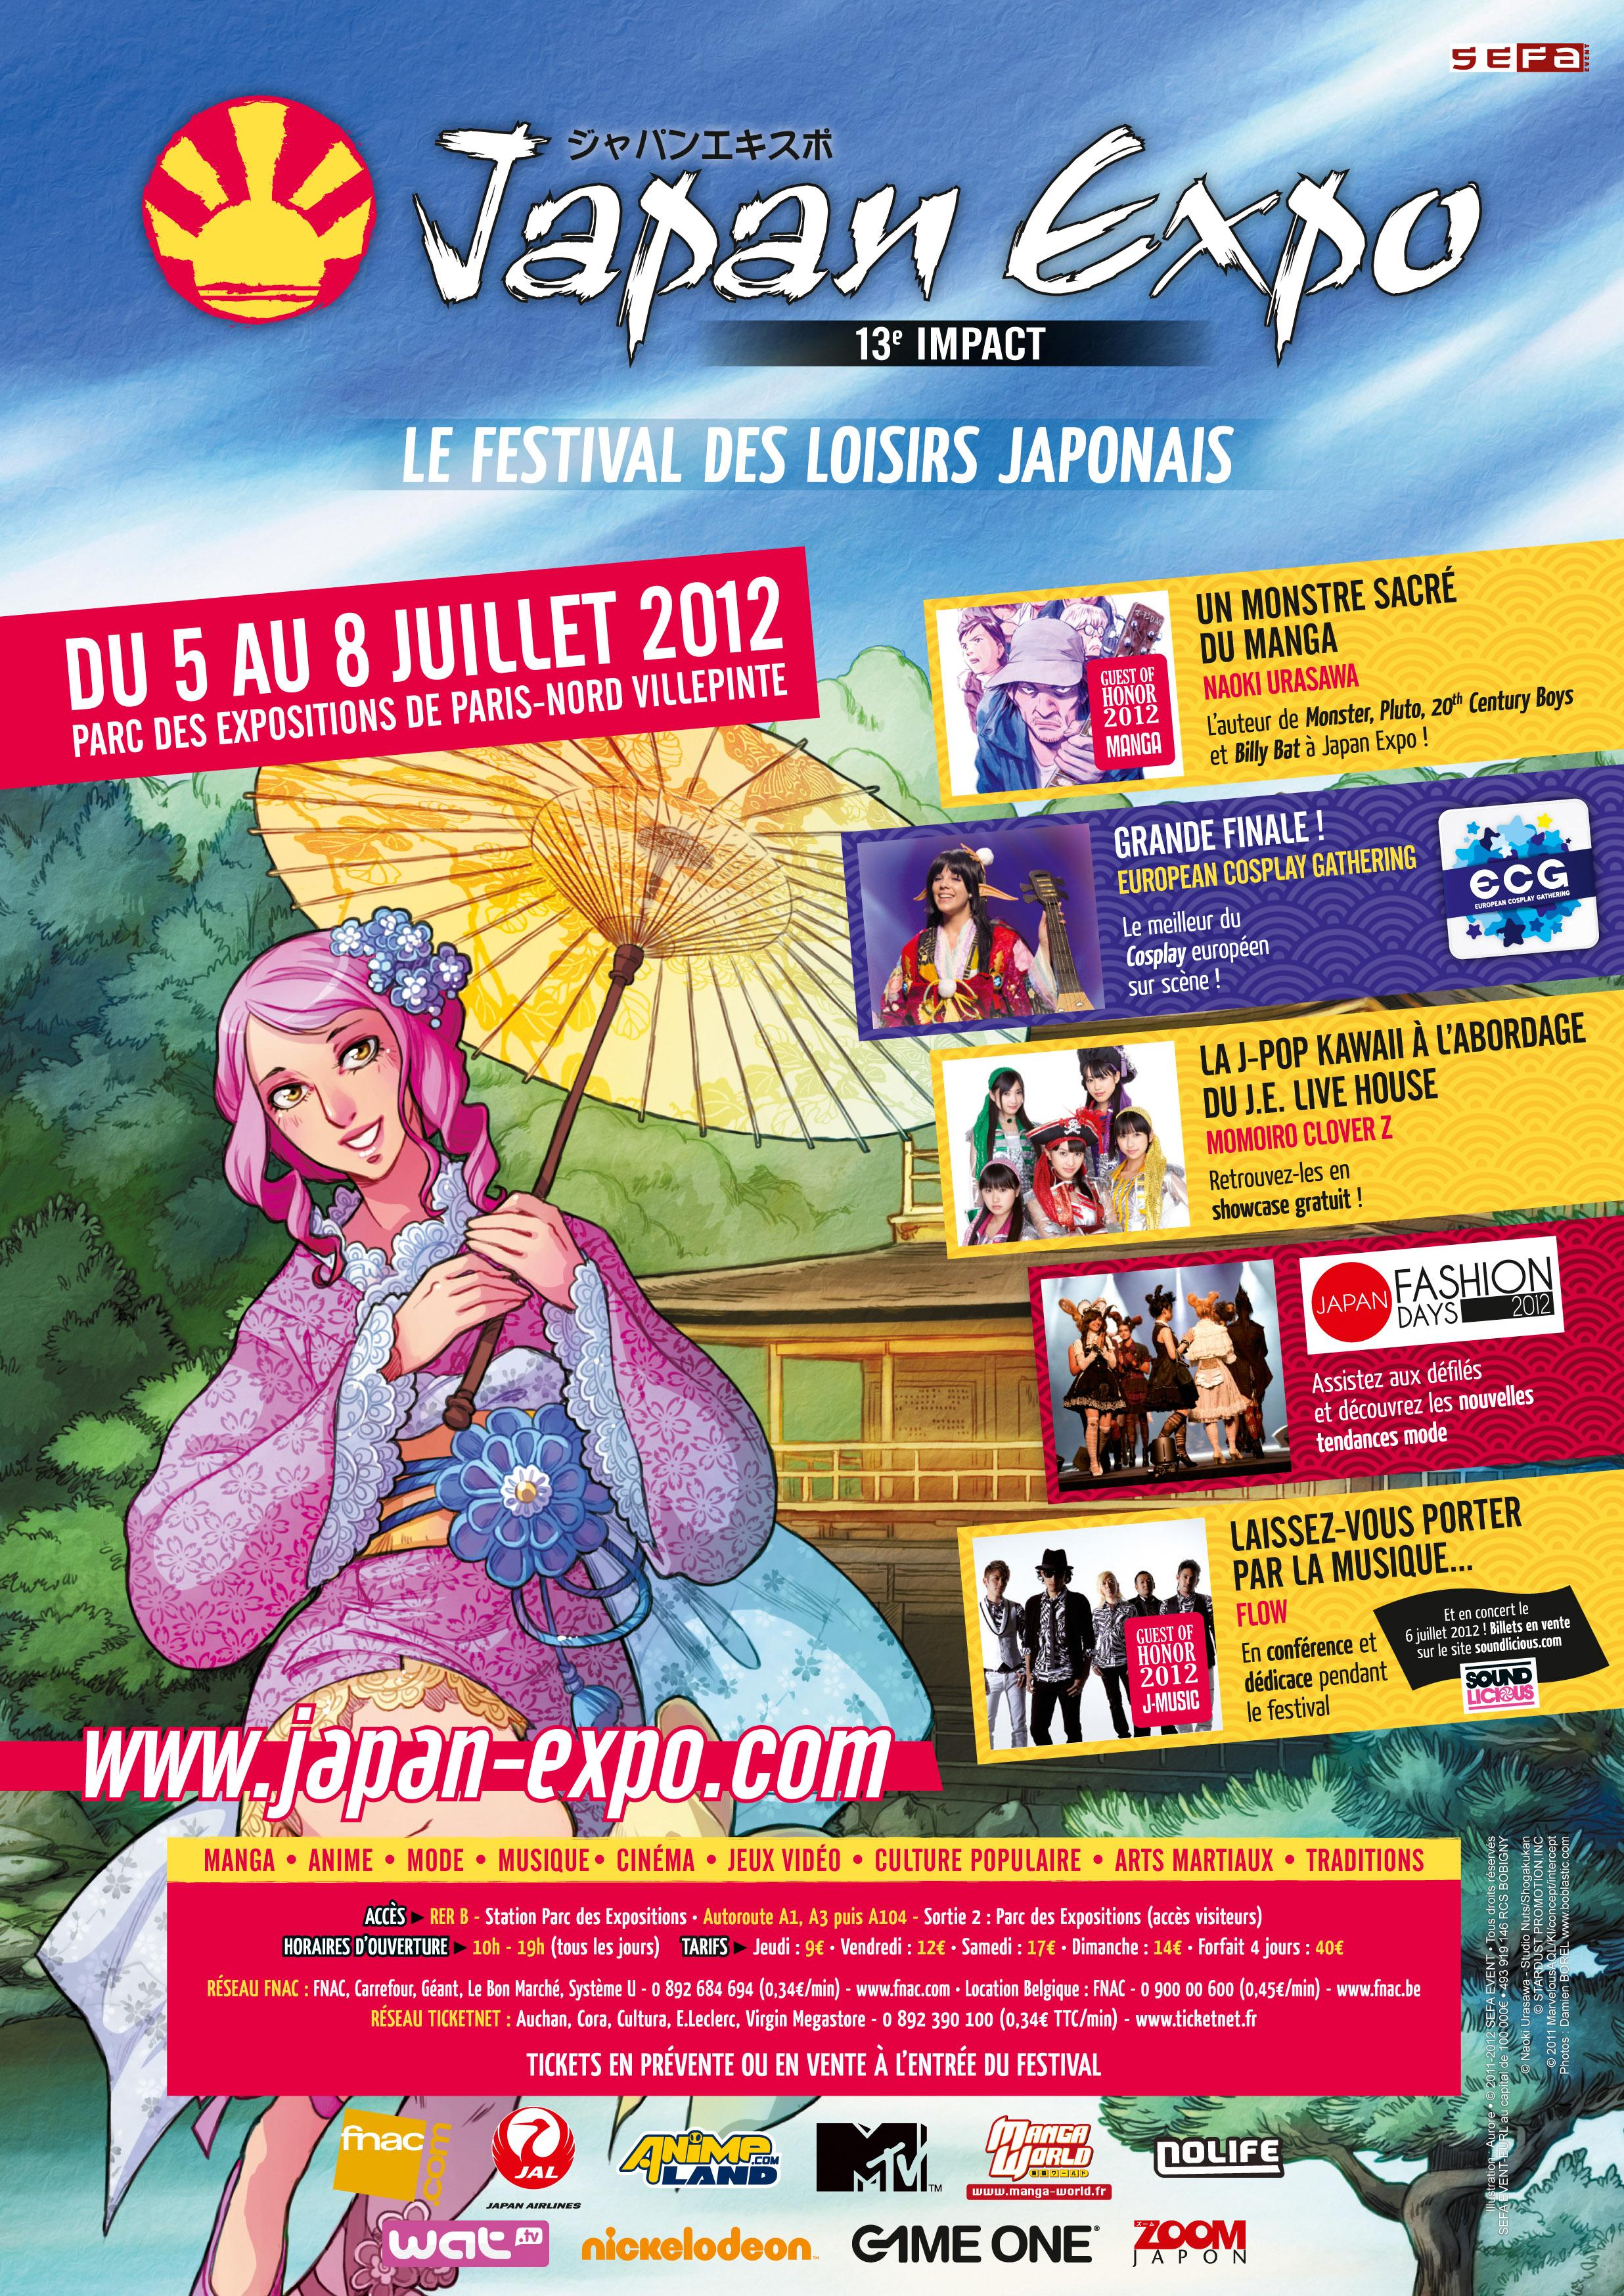 Japan expo 2012 v nement manga news - Japan expo paris 2017 ...